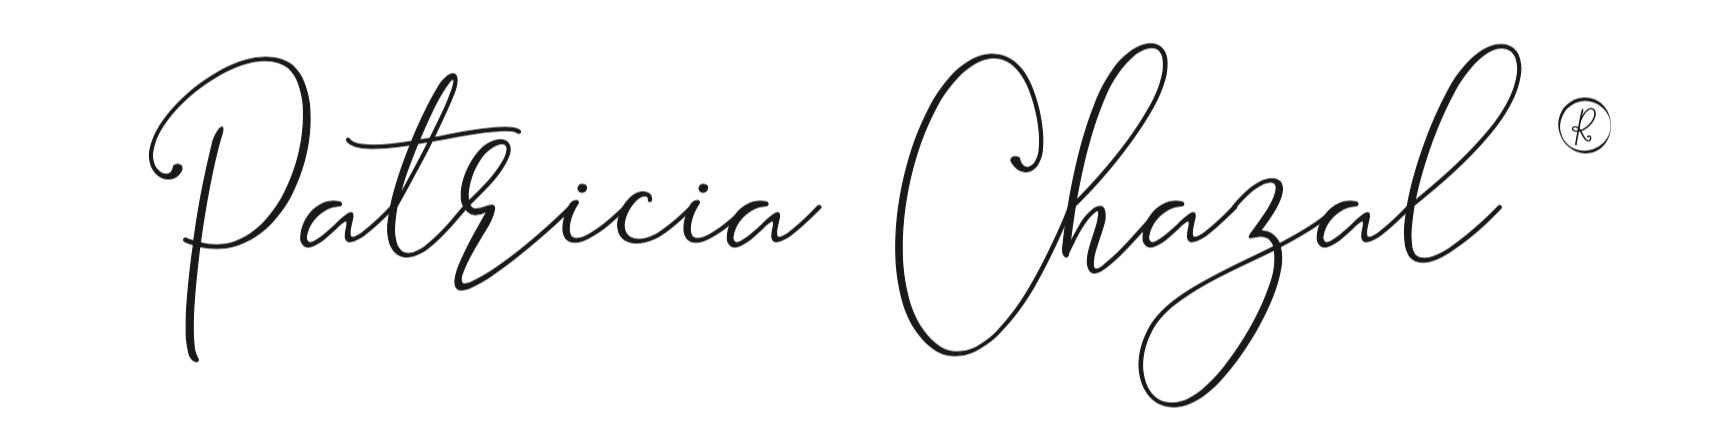 PATRICIA CHAZAL